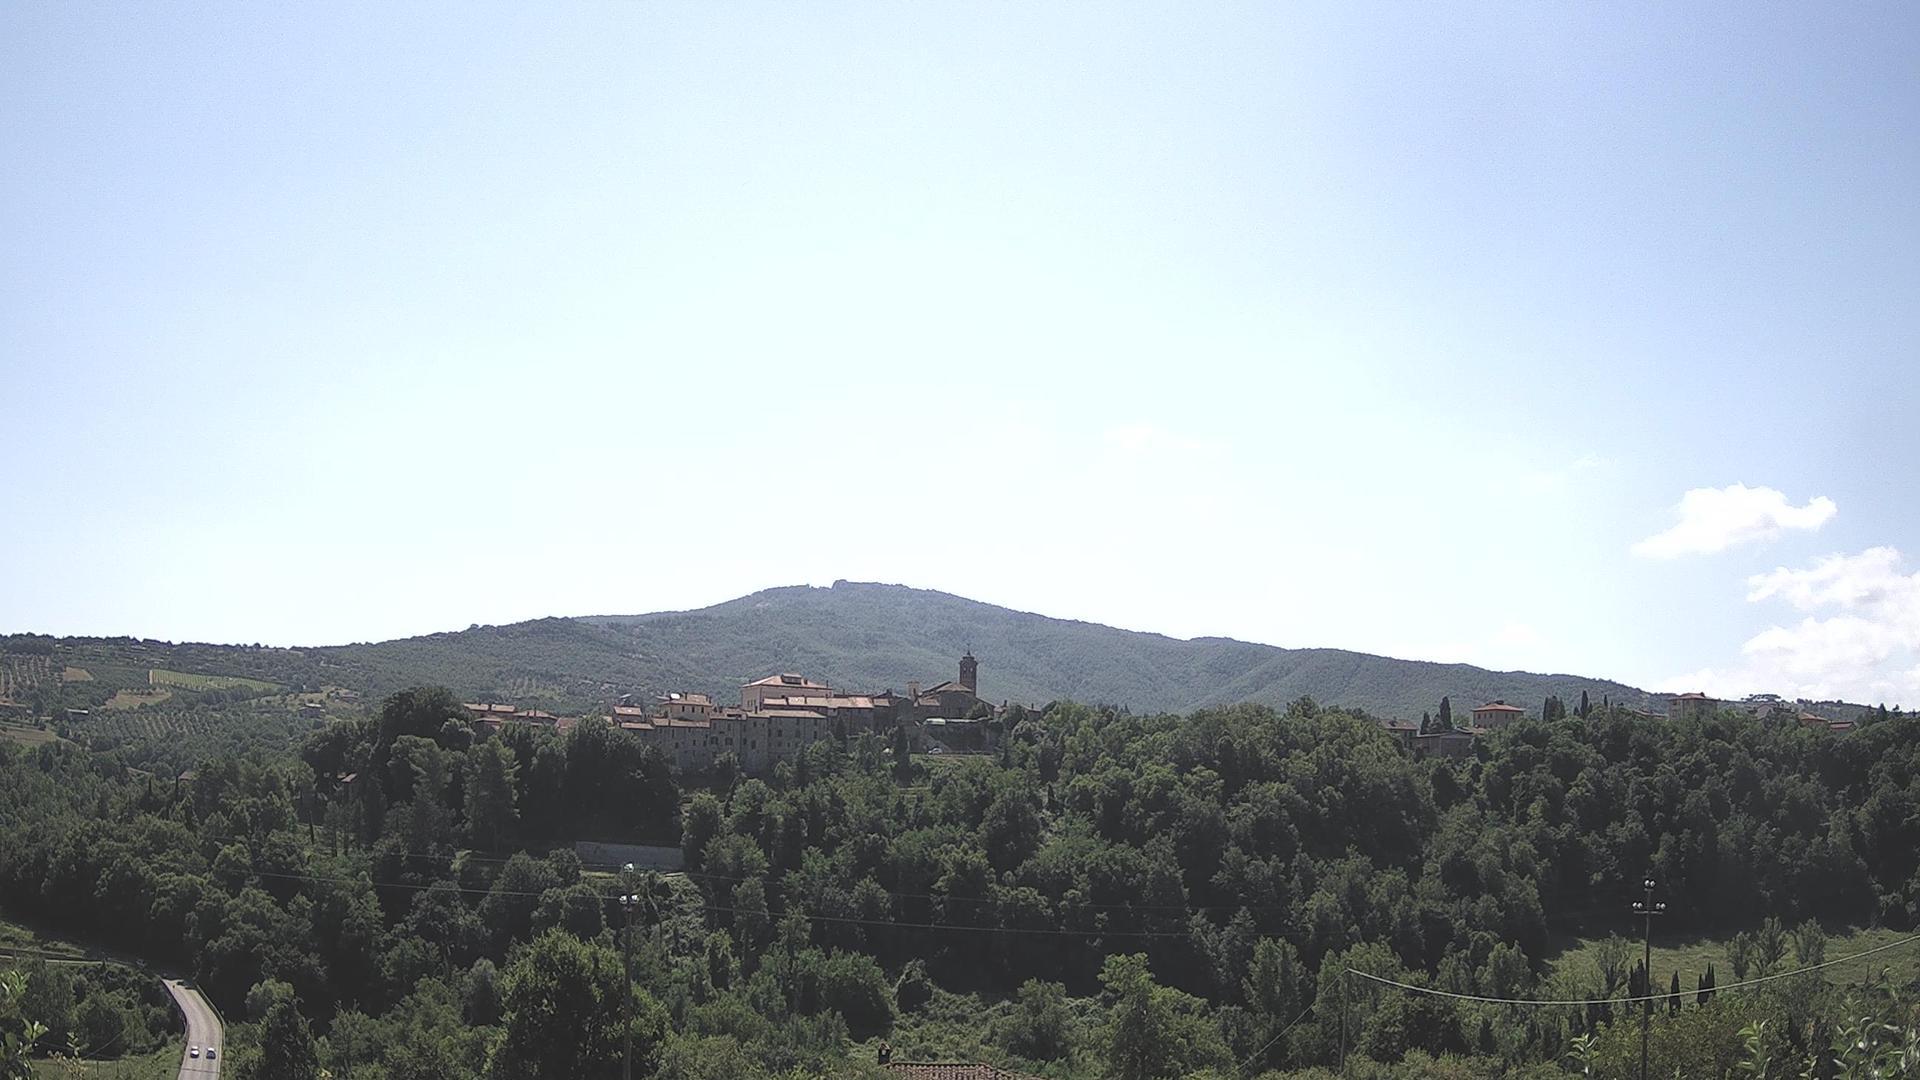 Webcam Piegaro: Meteo